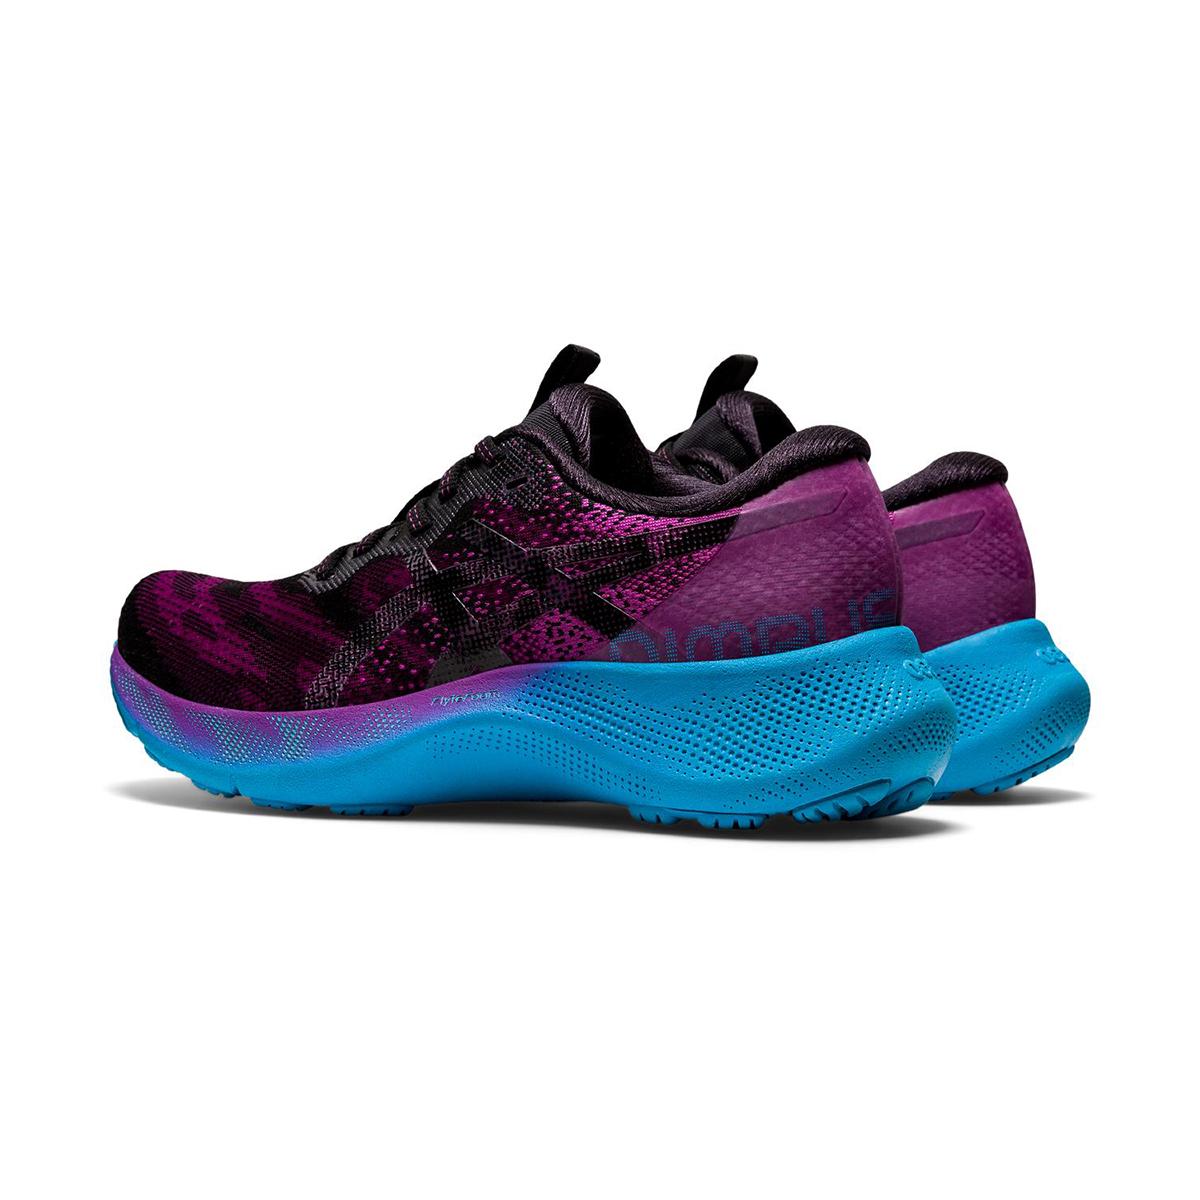 Women's Asics Gel-Nimbus Lite 2 Running Shoe - Color: Digital Grape/Black - Size: 5 - Width: Regular, Digital Grape/Black, large, image 4